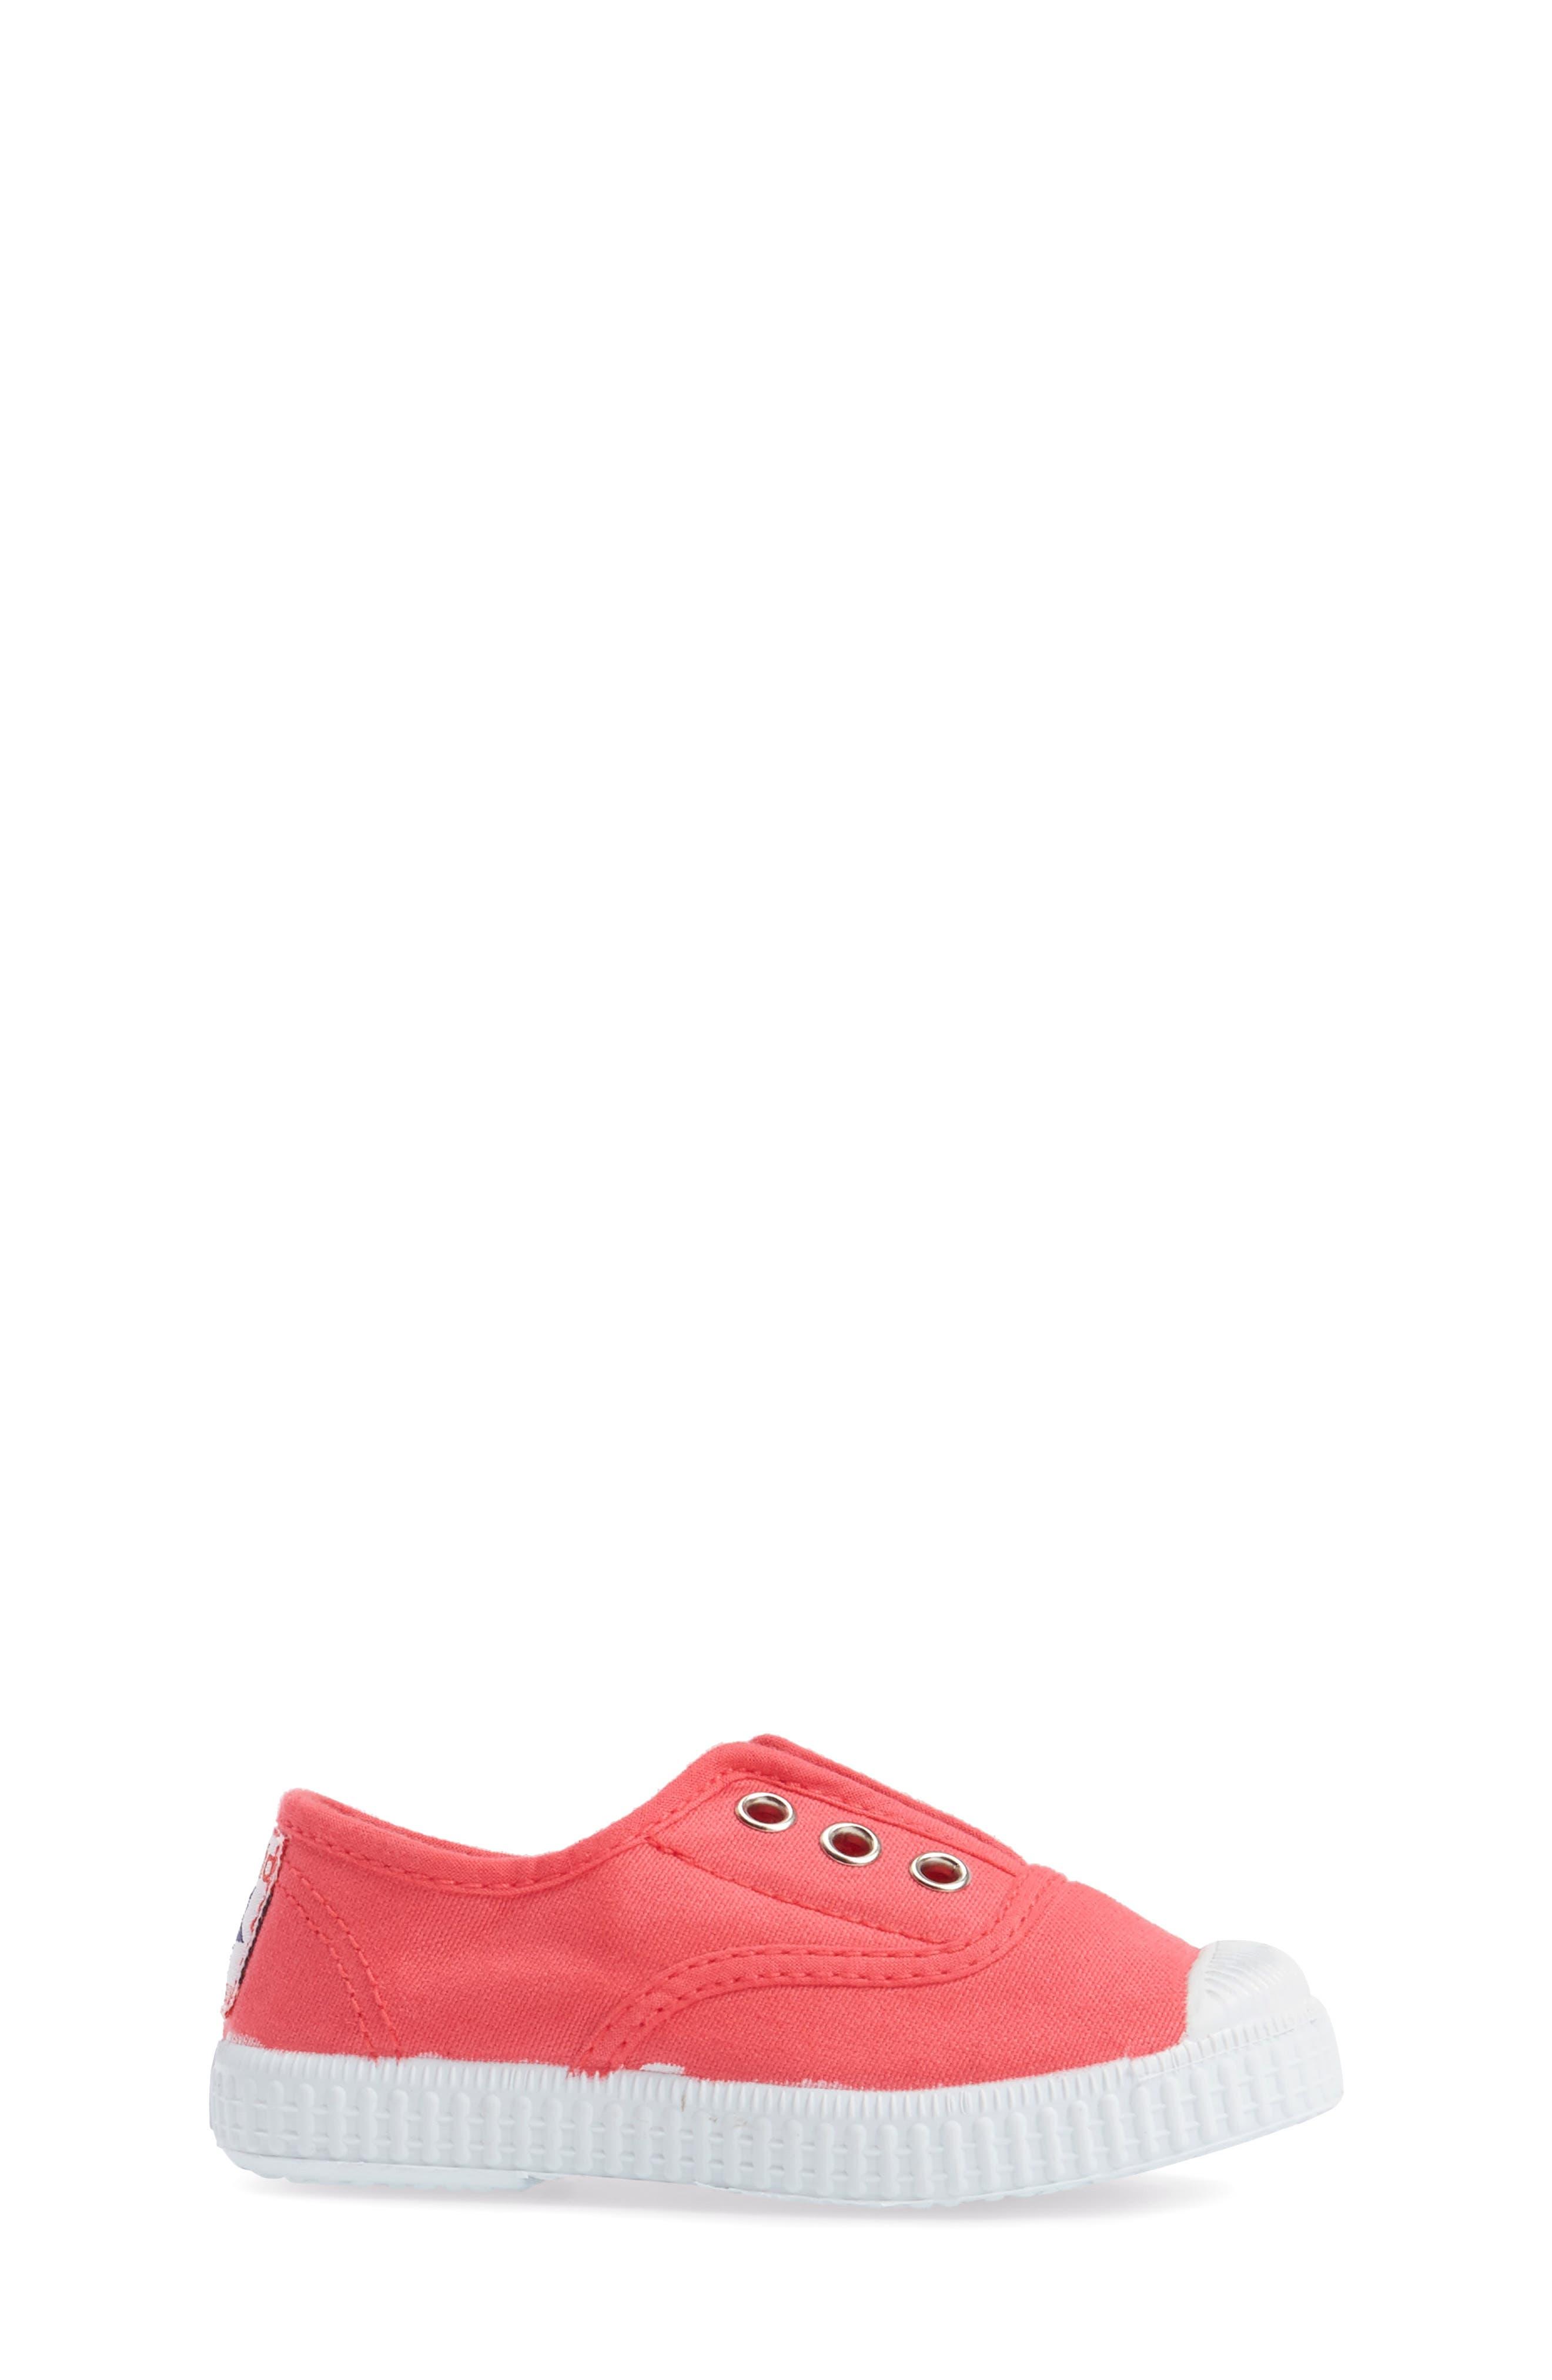 Alternate Image 3  - Cienta Laceless Slip-On Sneaker (Walker & Toddler)